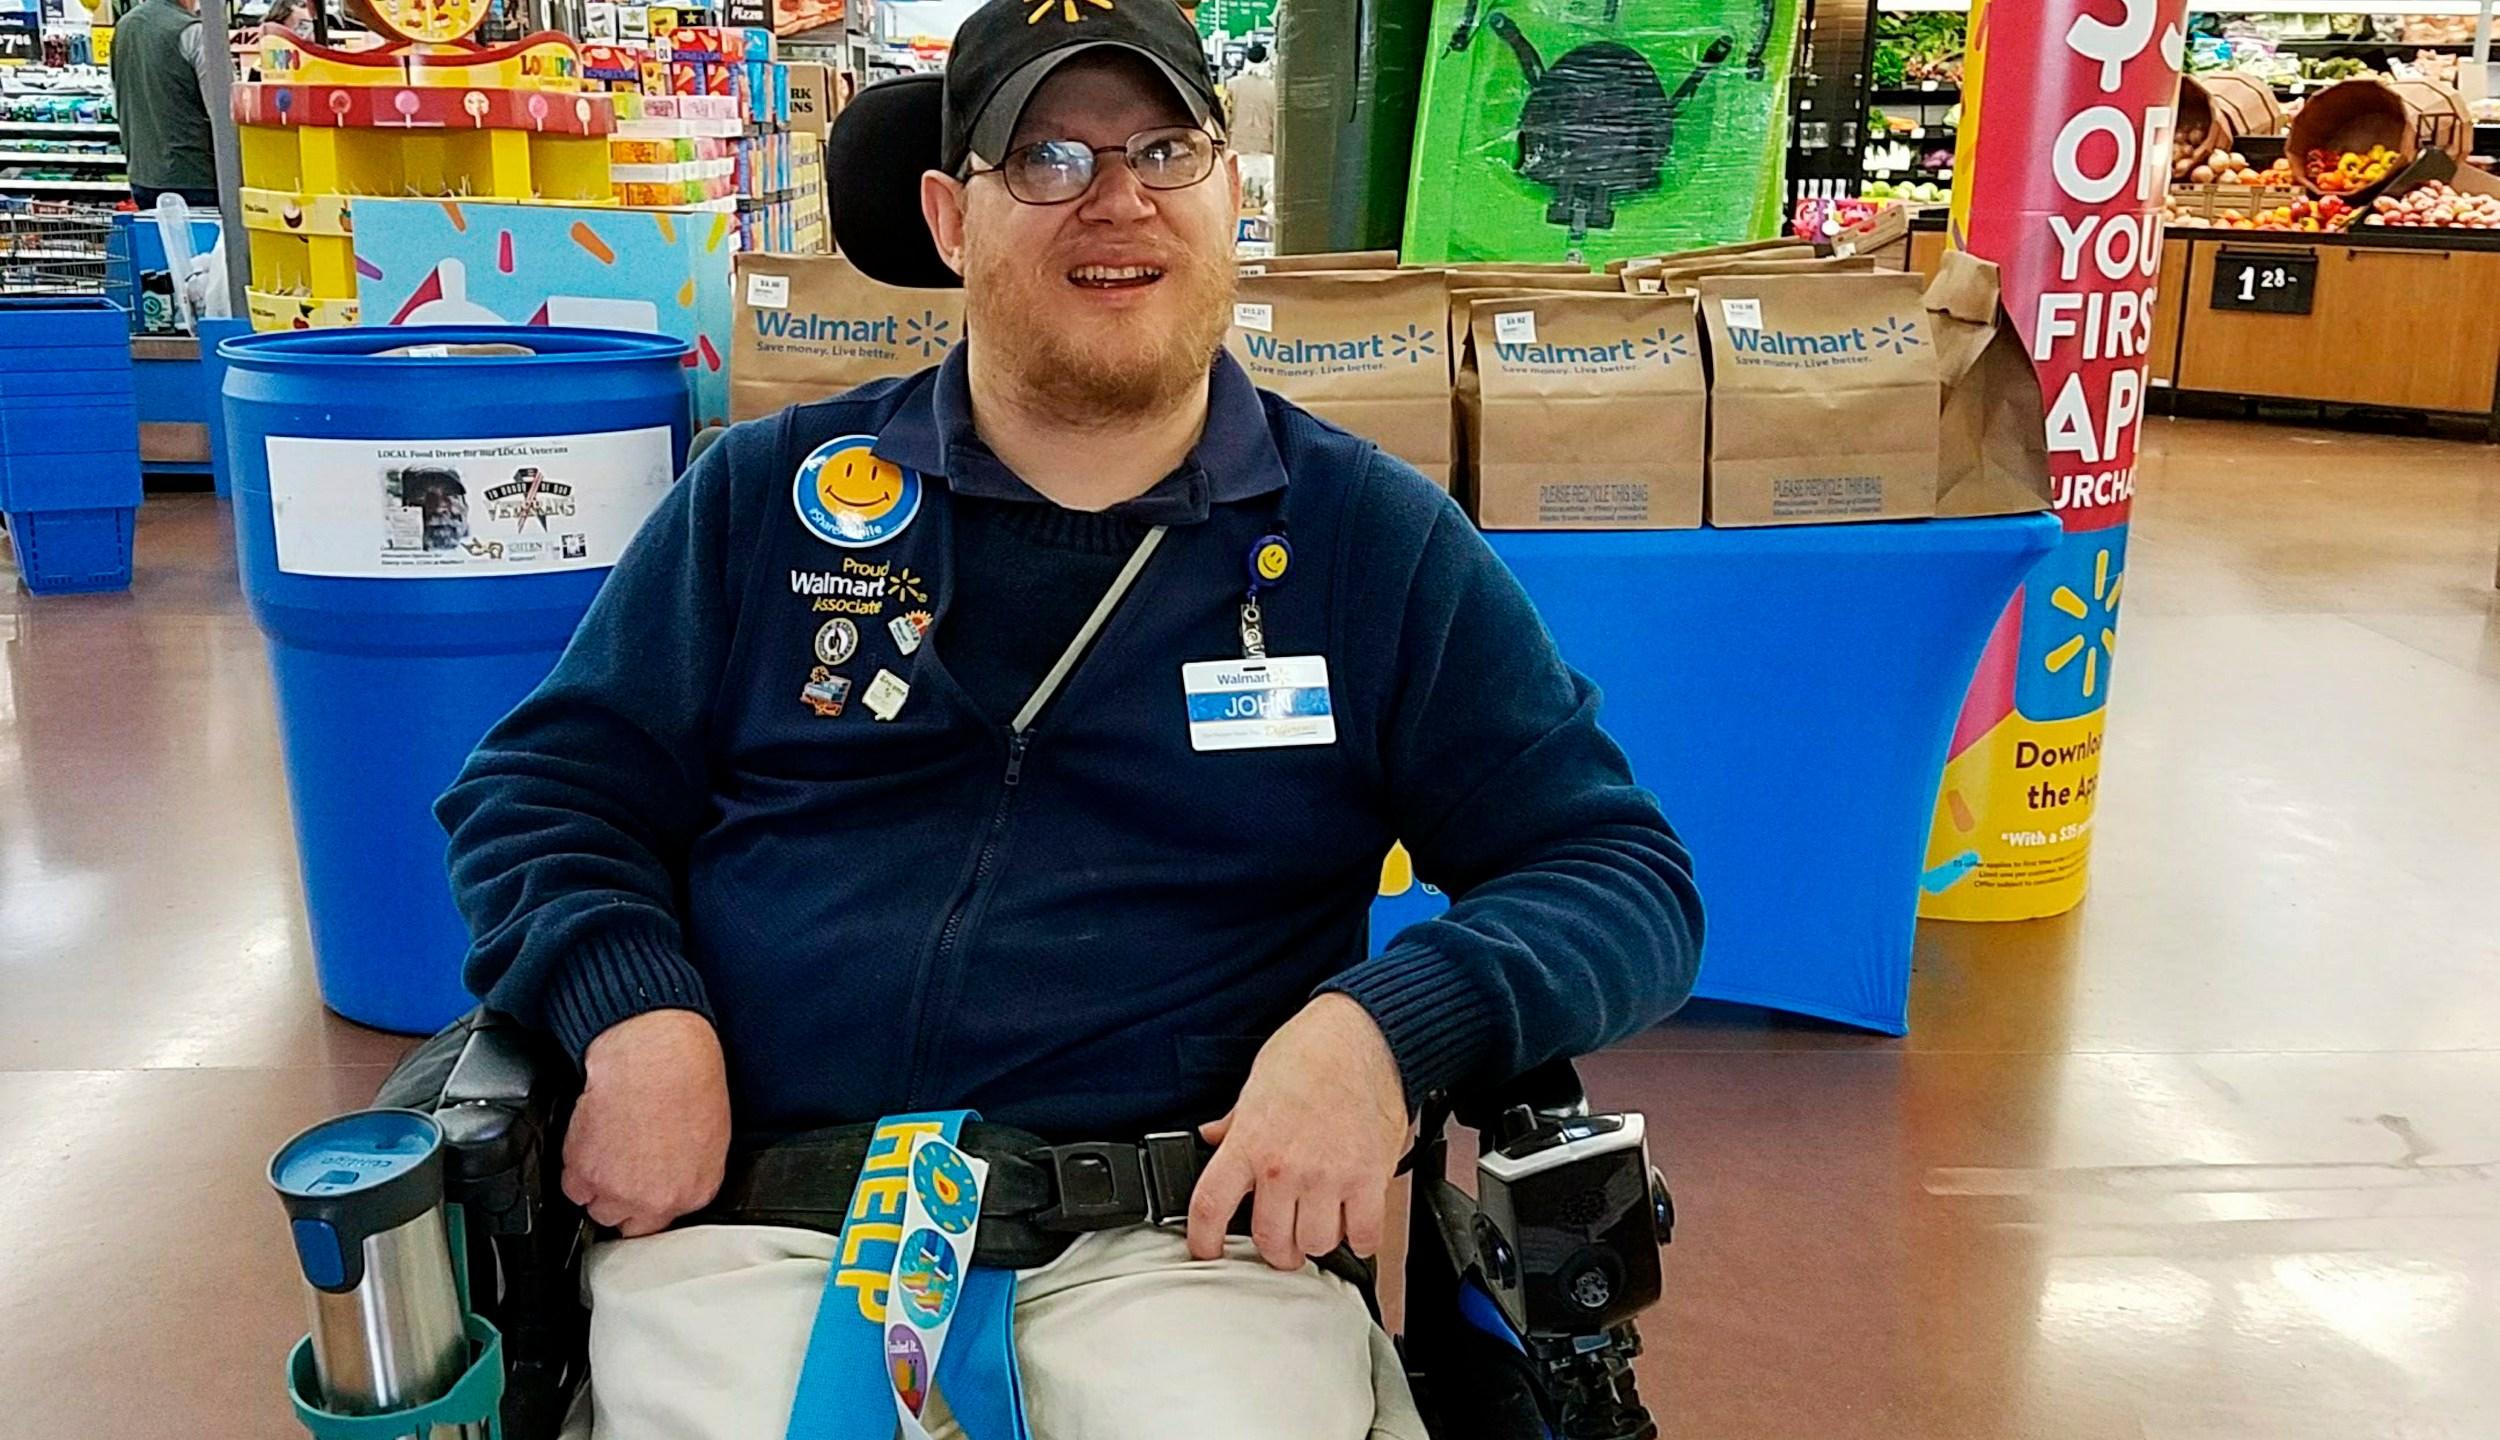 Walmart_Disabled_Greeters_28839-159532.jpg08026621